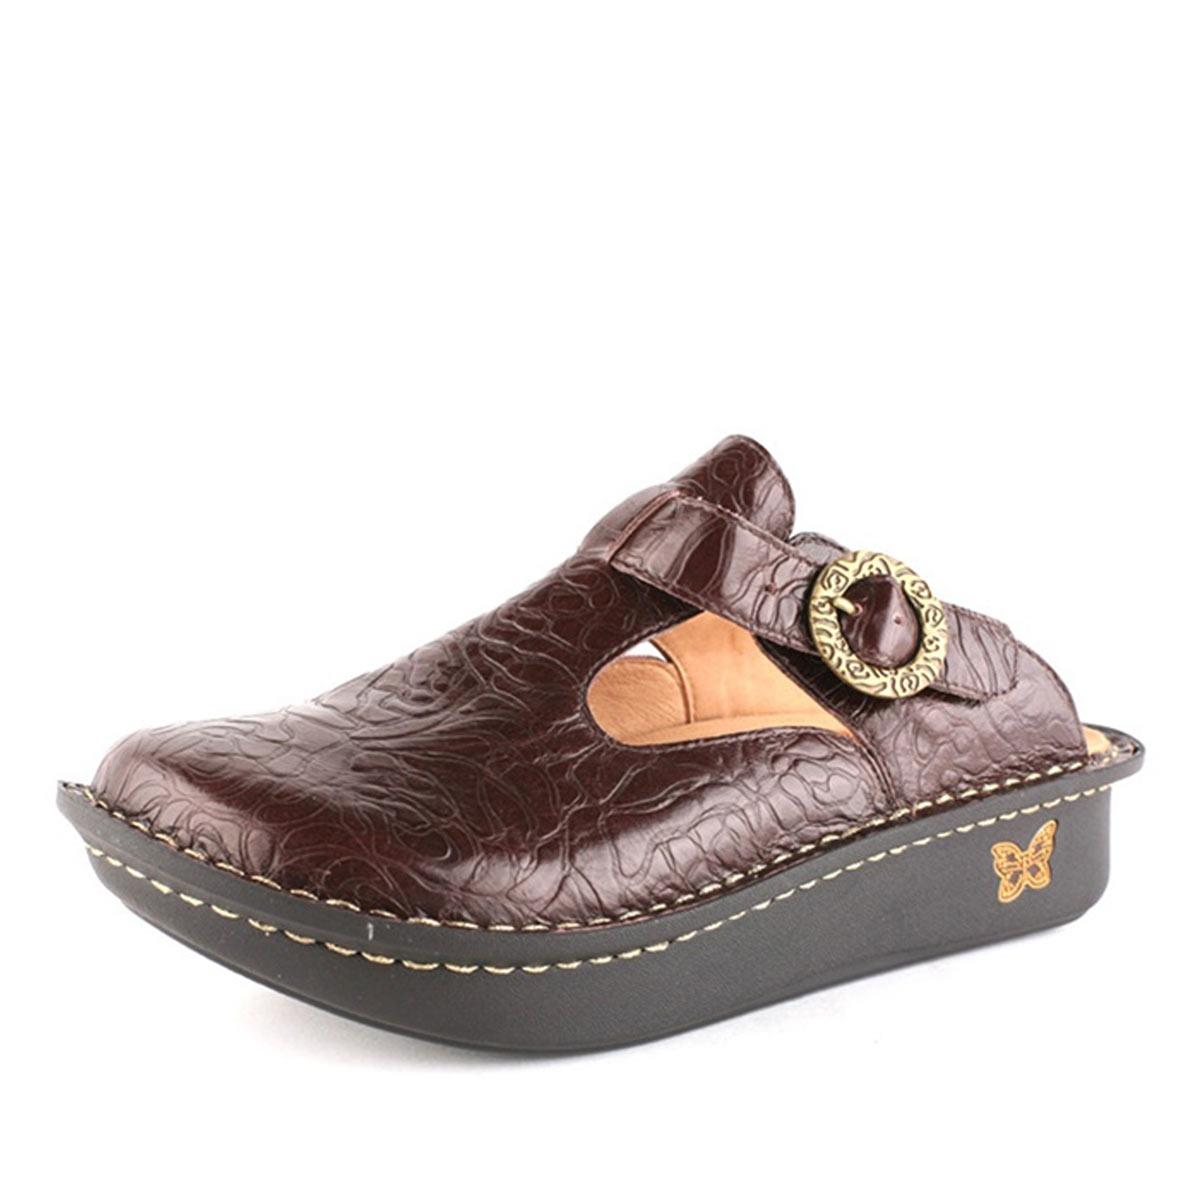 Brown Alegria Shoes